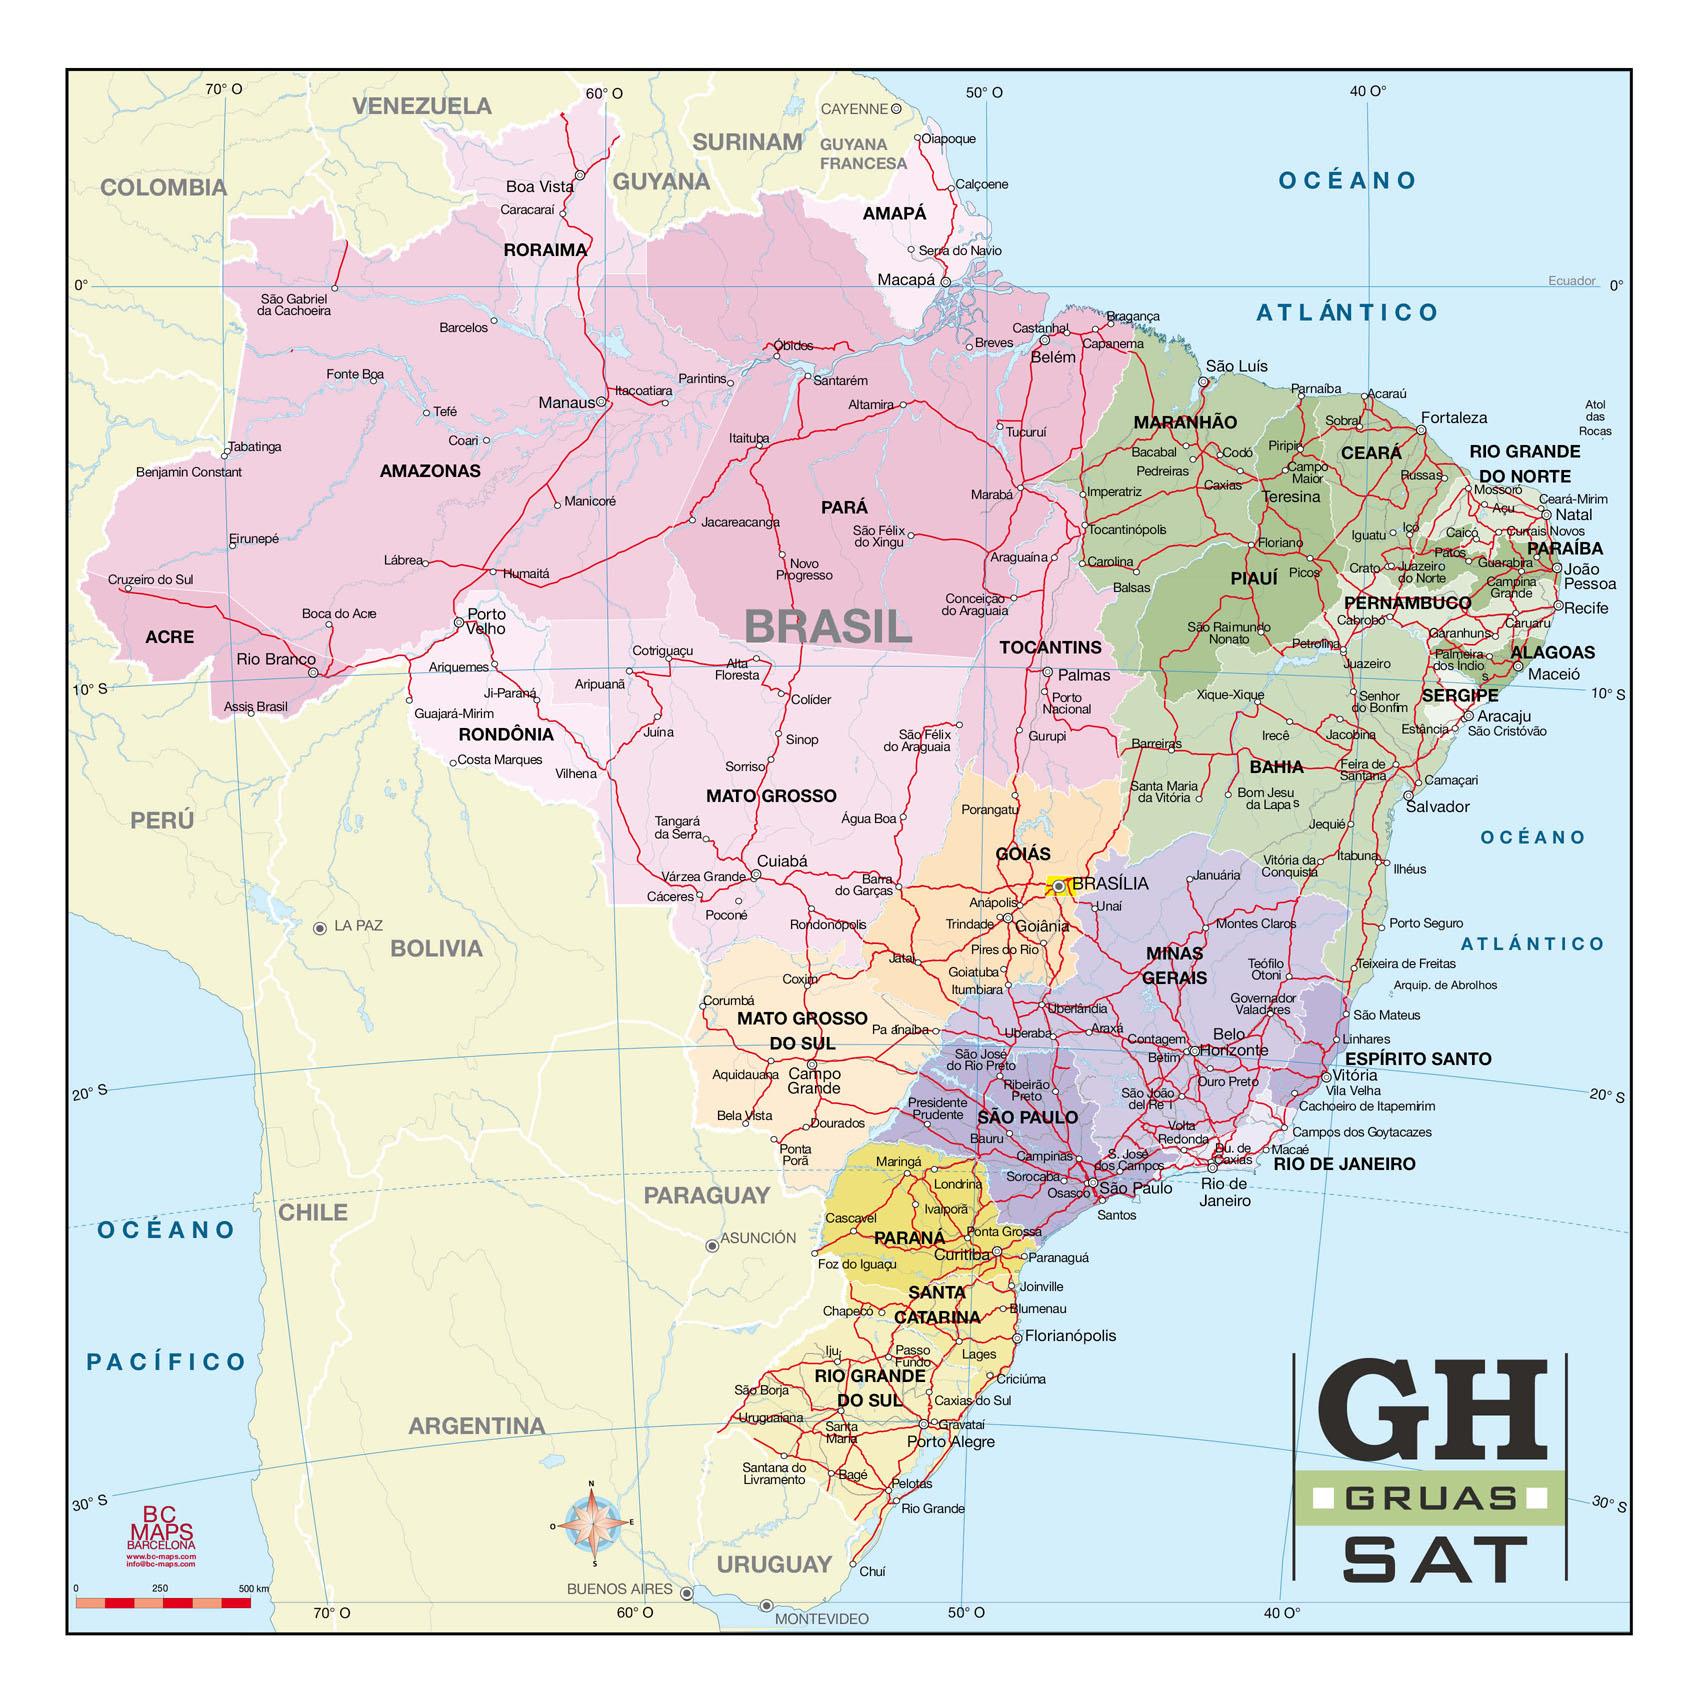 Brasil Vector City Maps Eps Illustrator Freehand Corel Draw - Germany map eps